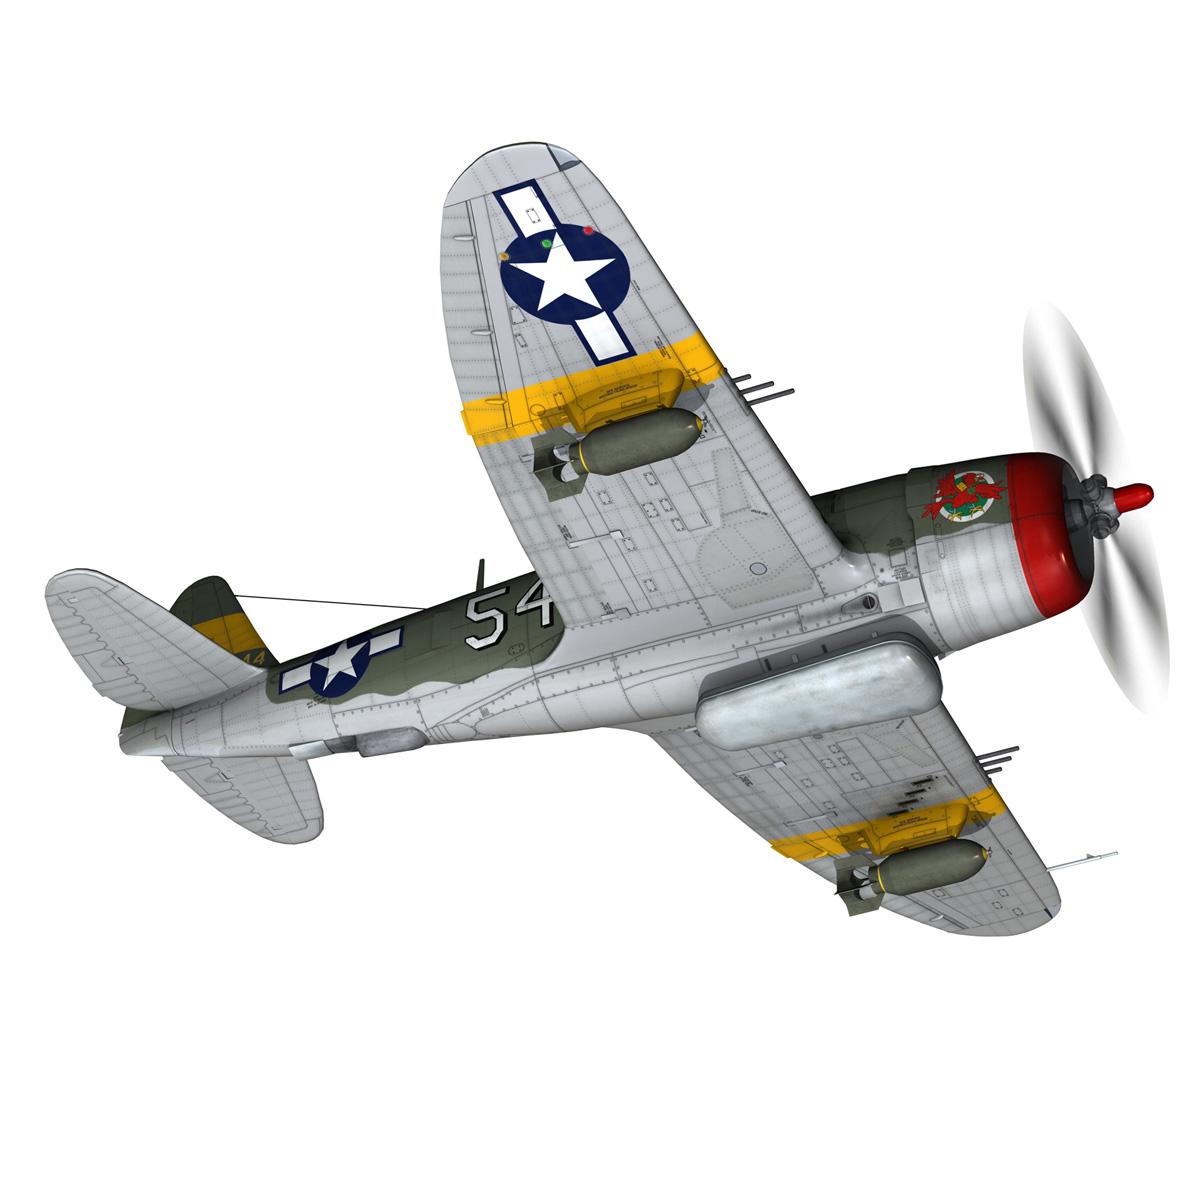 republic p-47d thunderbolt – little bunny 3d model fbx c4d lwo obj 274226